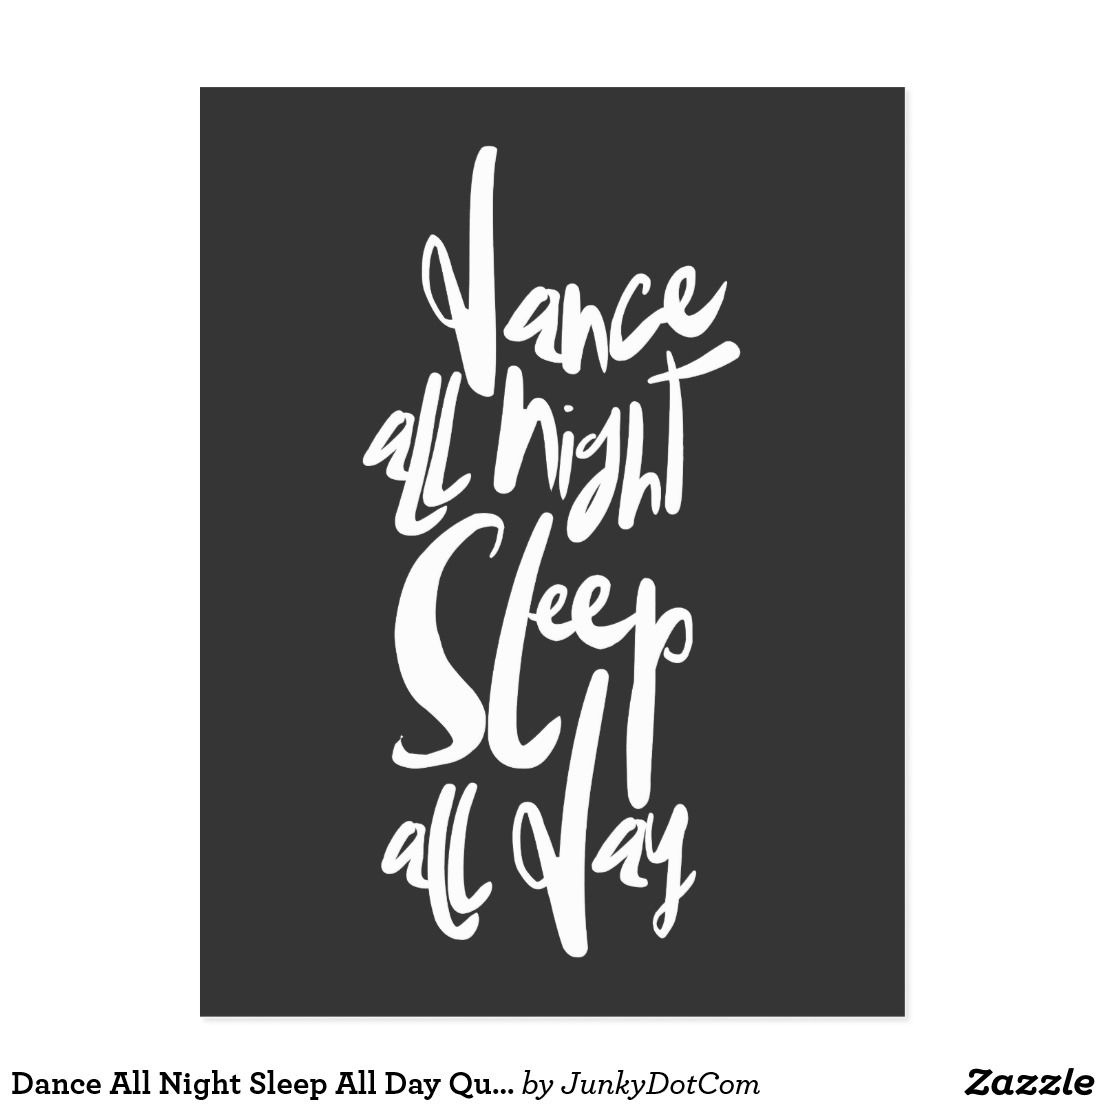 Beau Dance All Night Sleep All Day Quote Postcard July 25 2017 #zazzle  #junkydotcom #